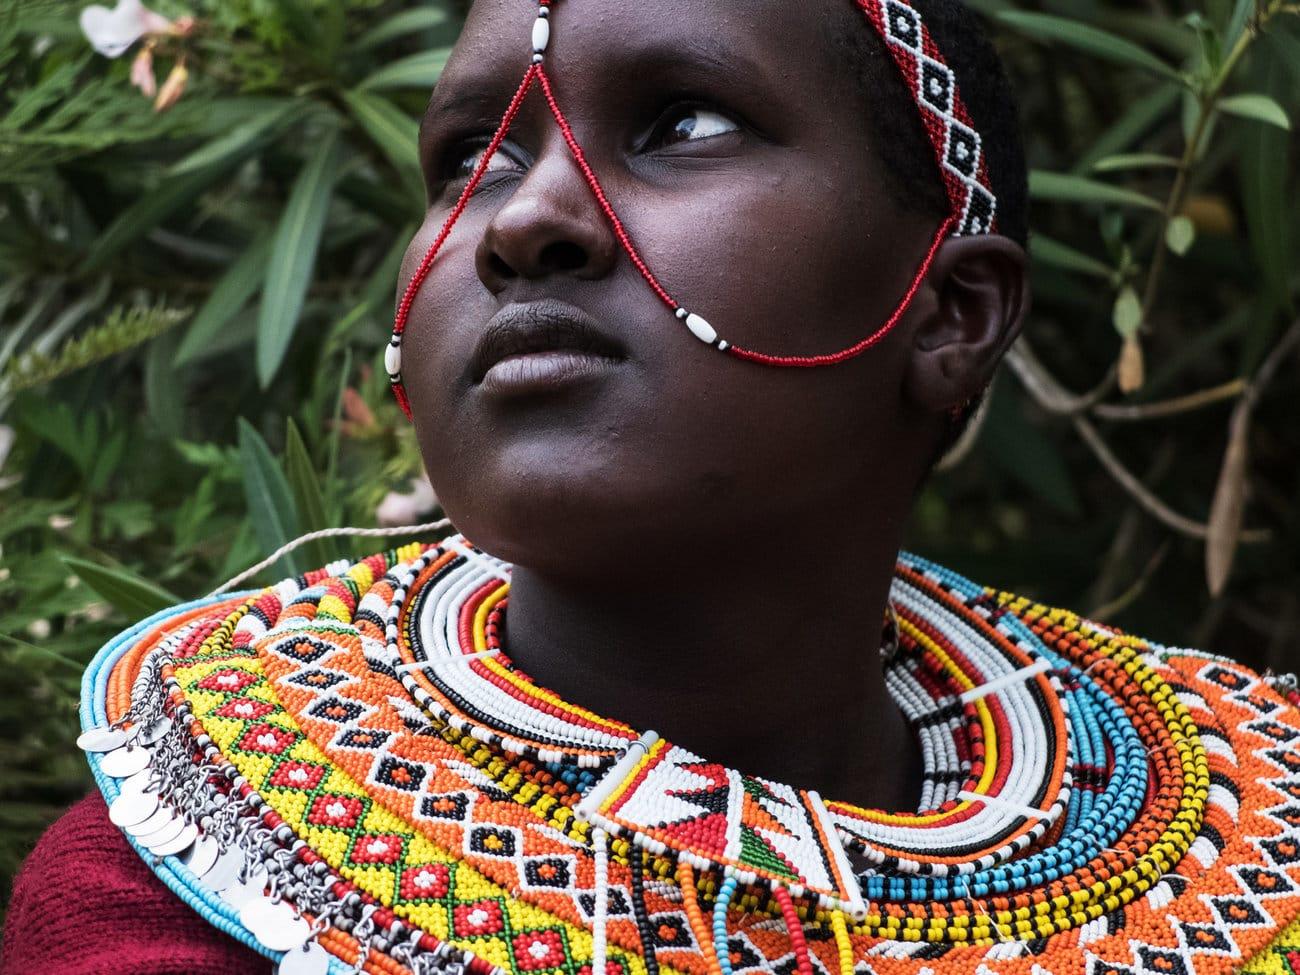 Modestar/Too Young To Wed/Samburu Girls Foundation